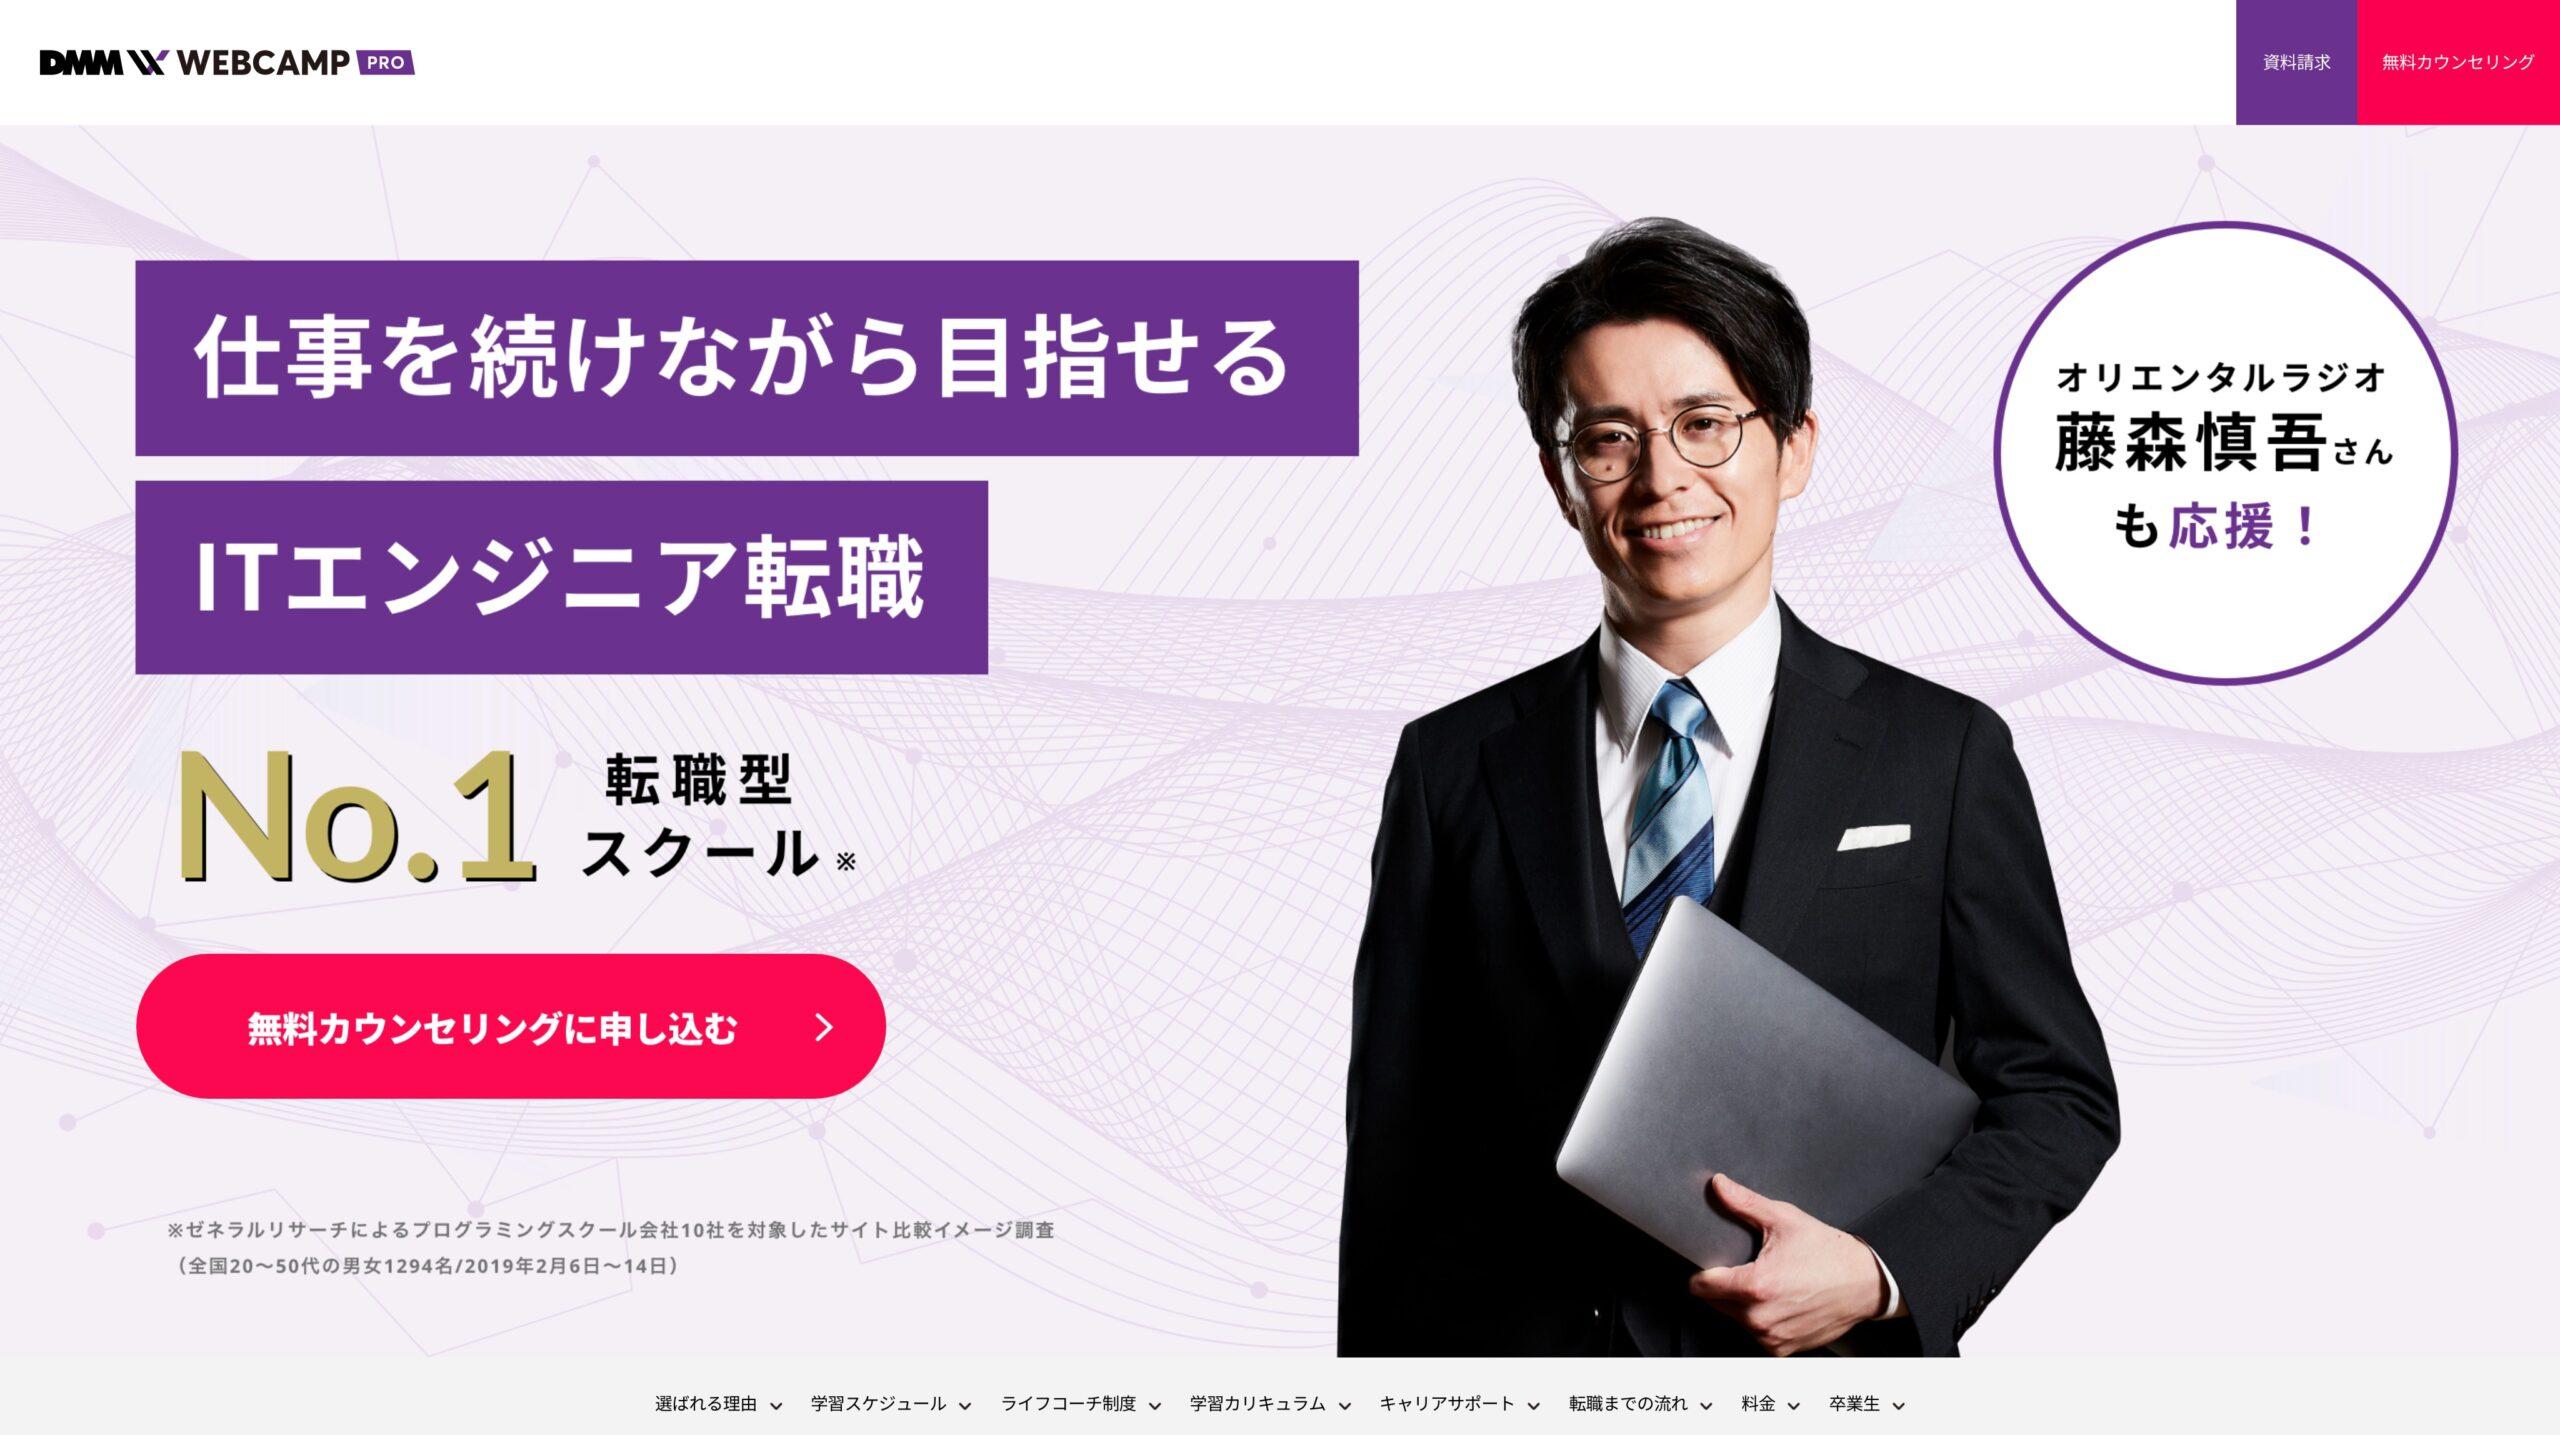 DMM WEBCAMP PRO公式サイト